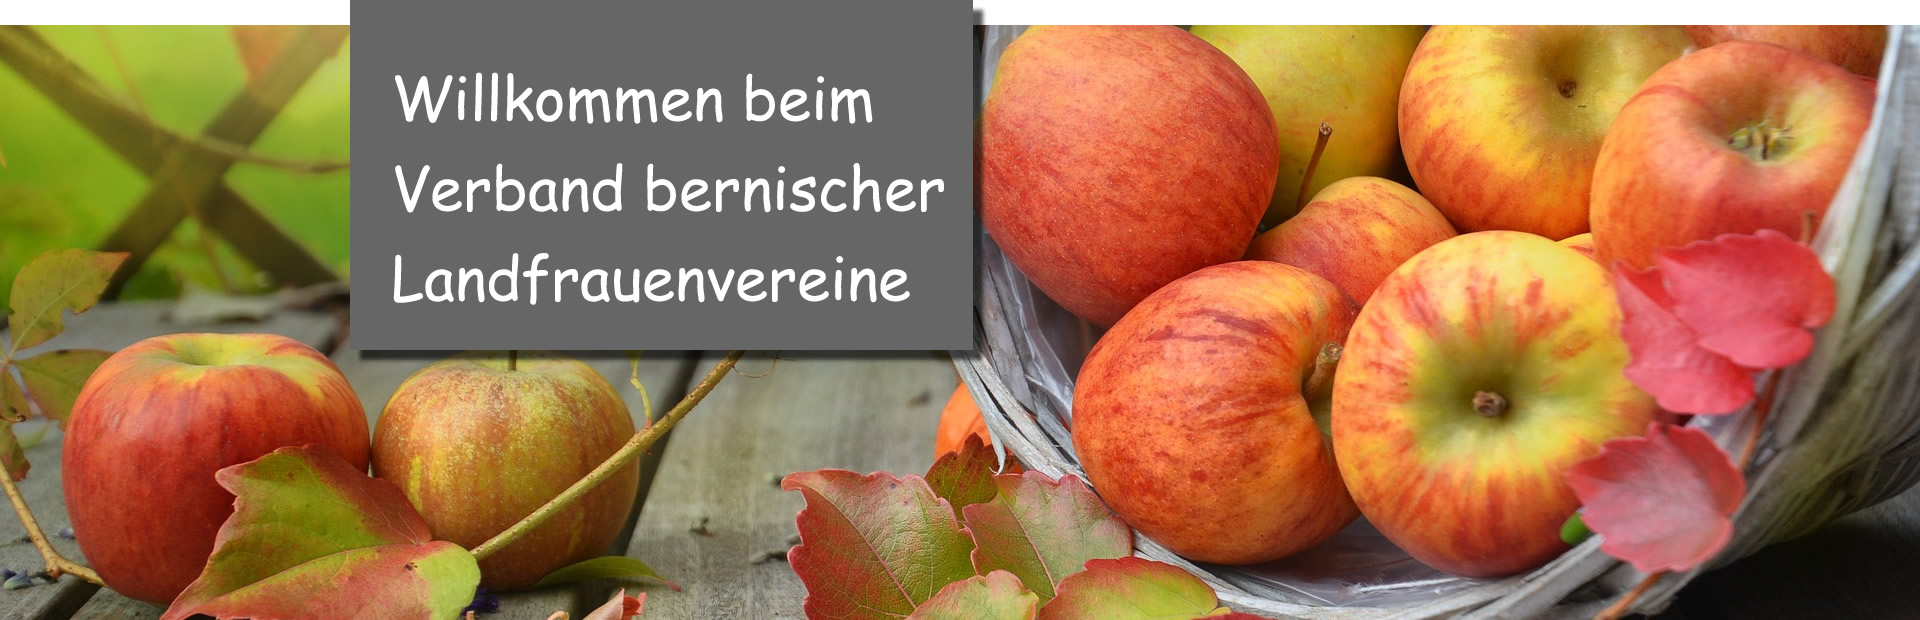 Apfelkorb_willkommen